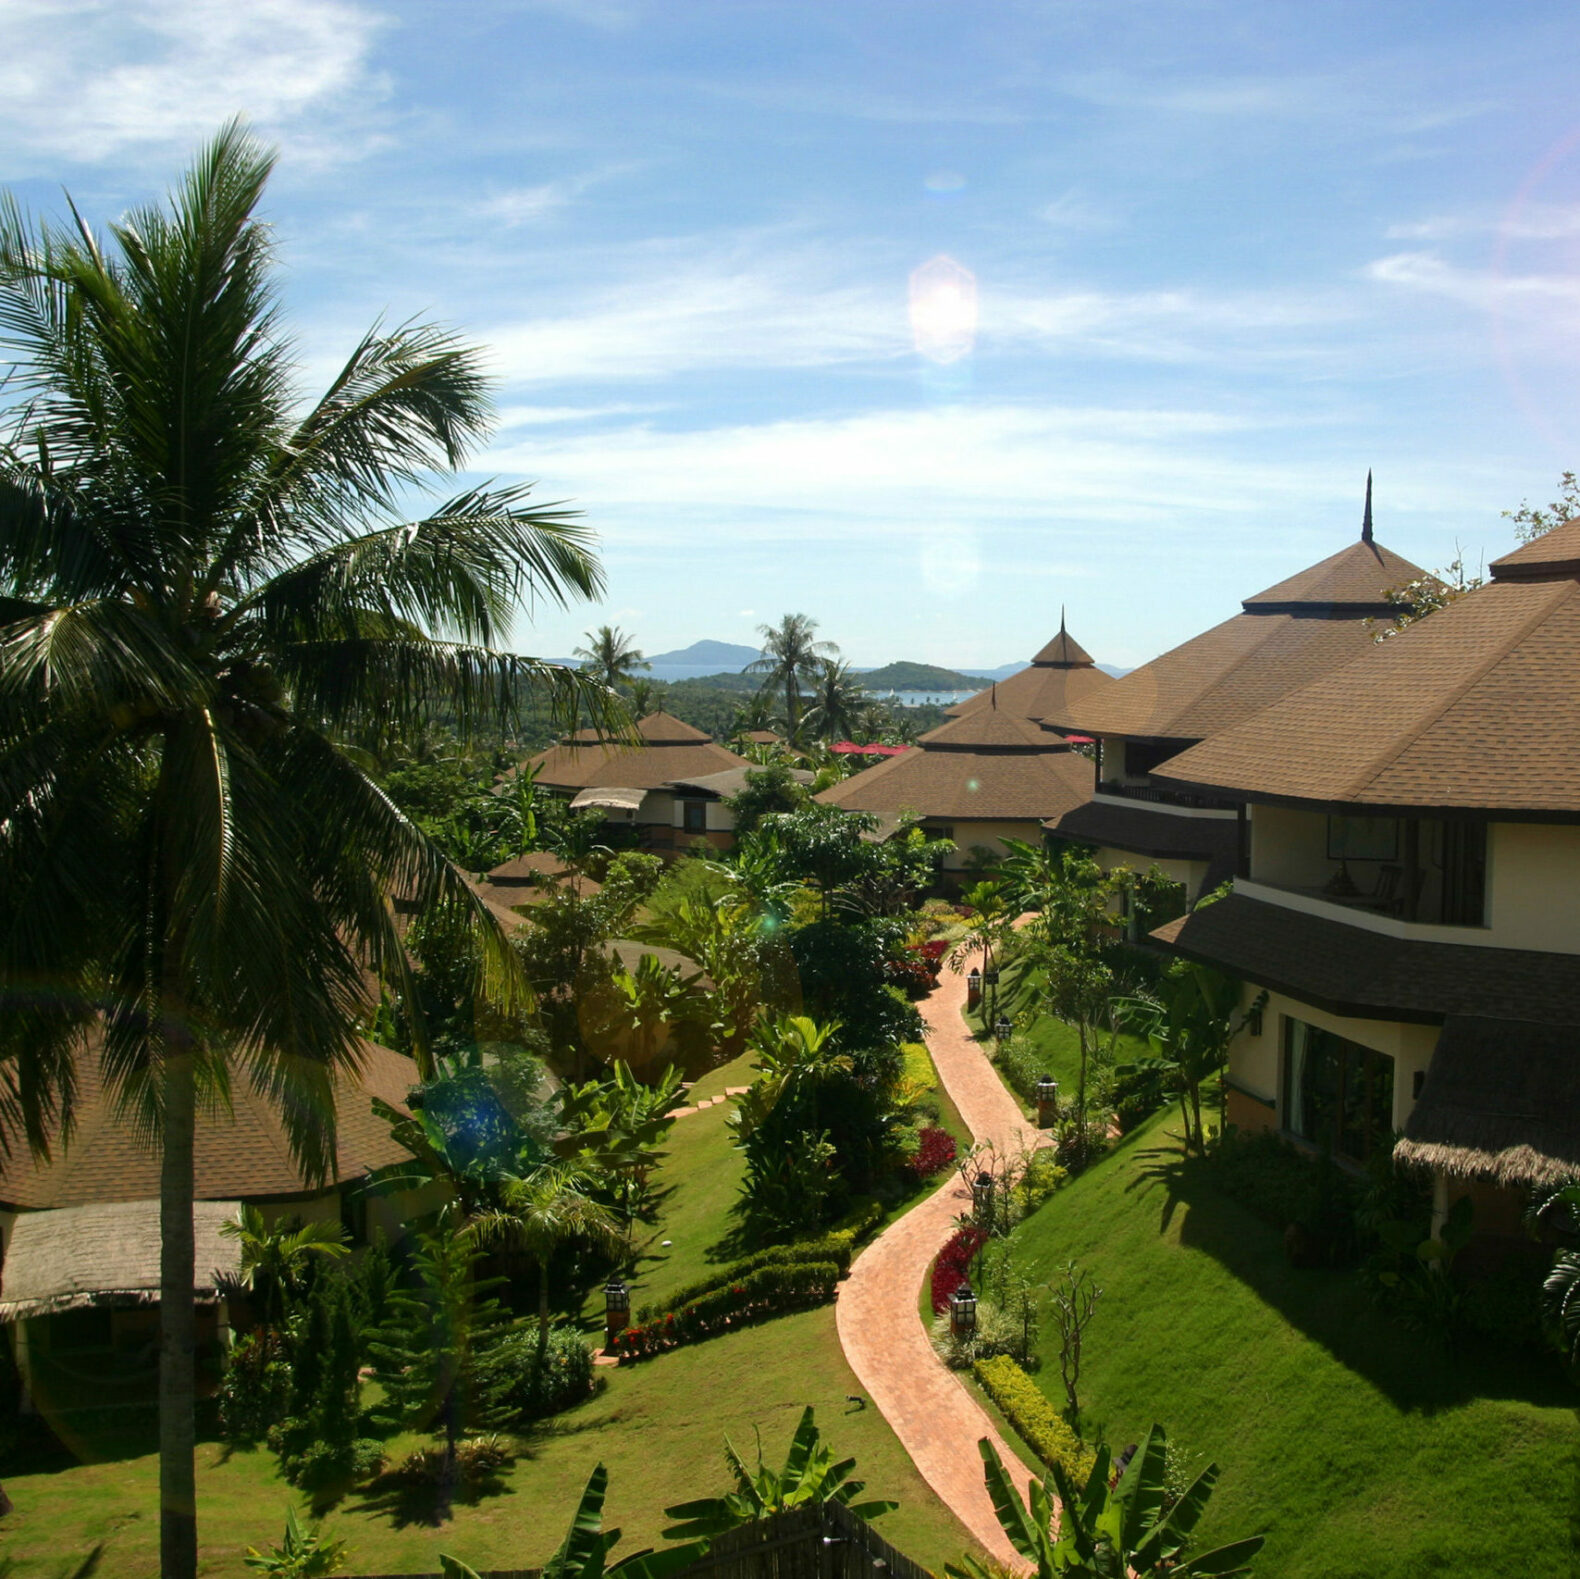 royal-villas-mangosteen-ayurveda-wellness-resort-thailand-scaled